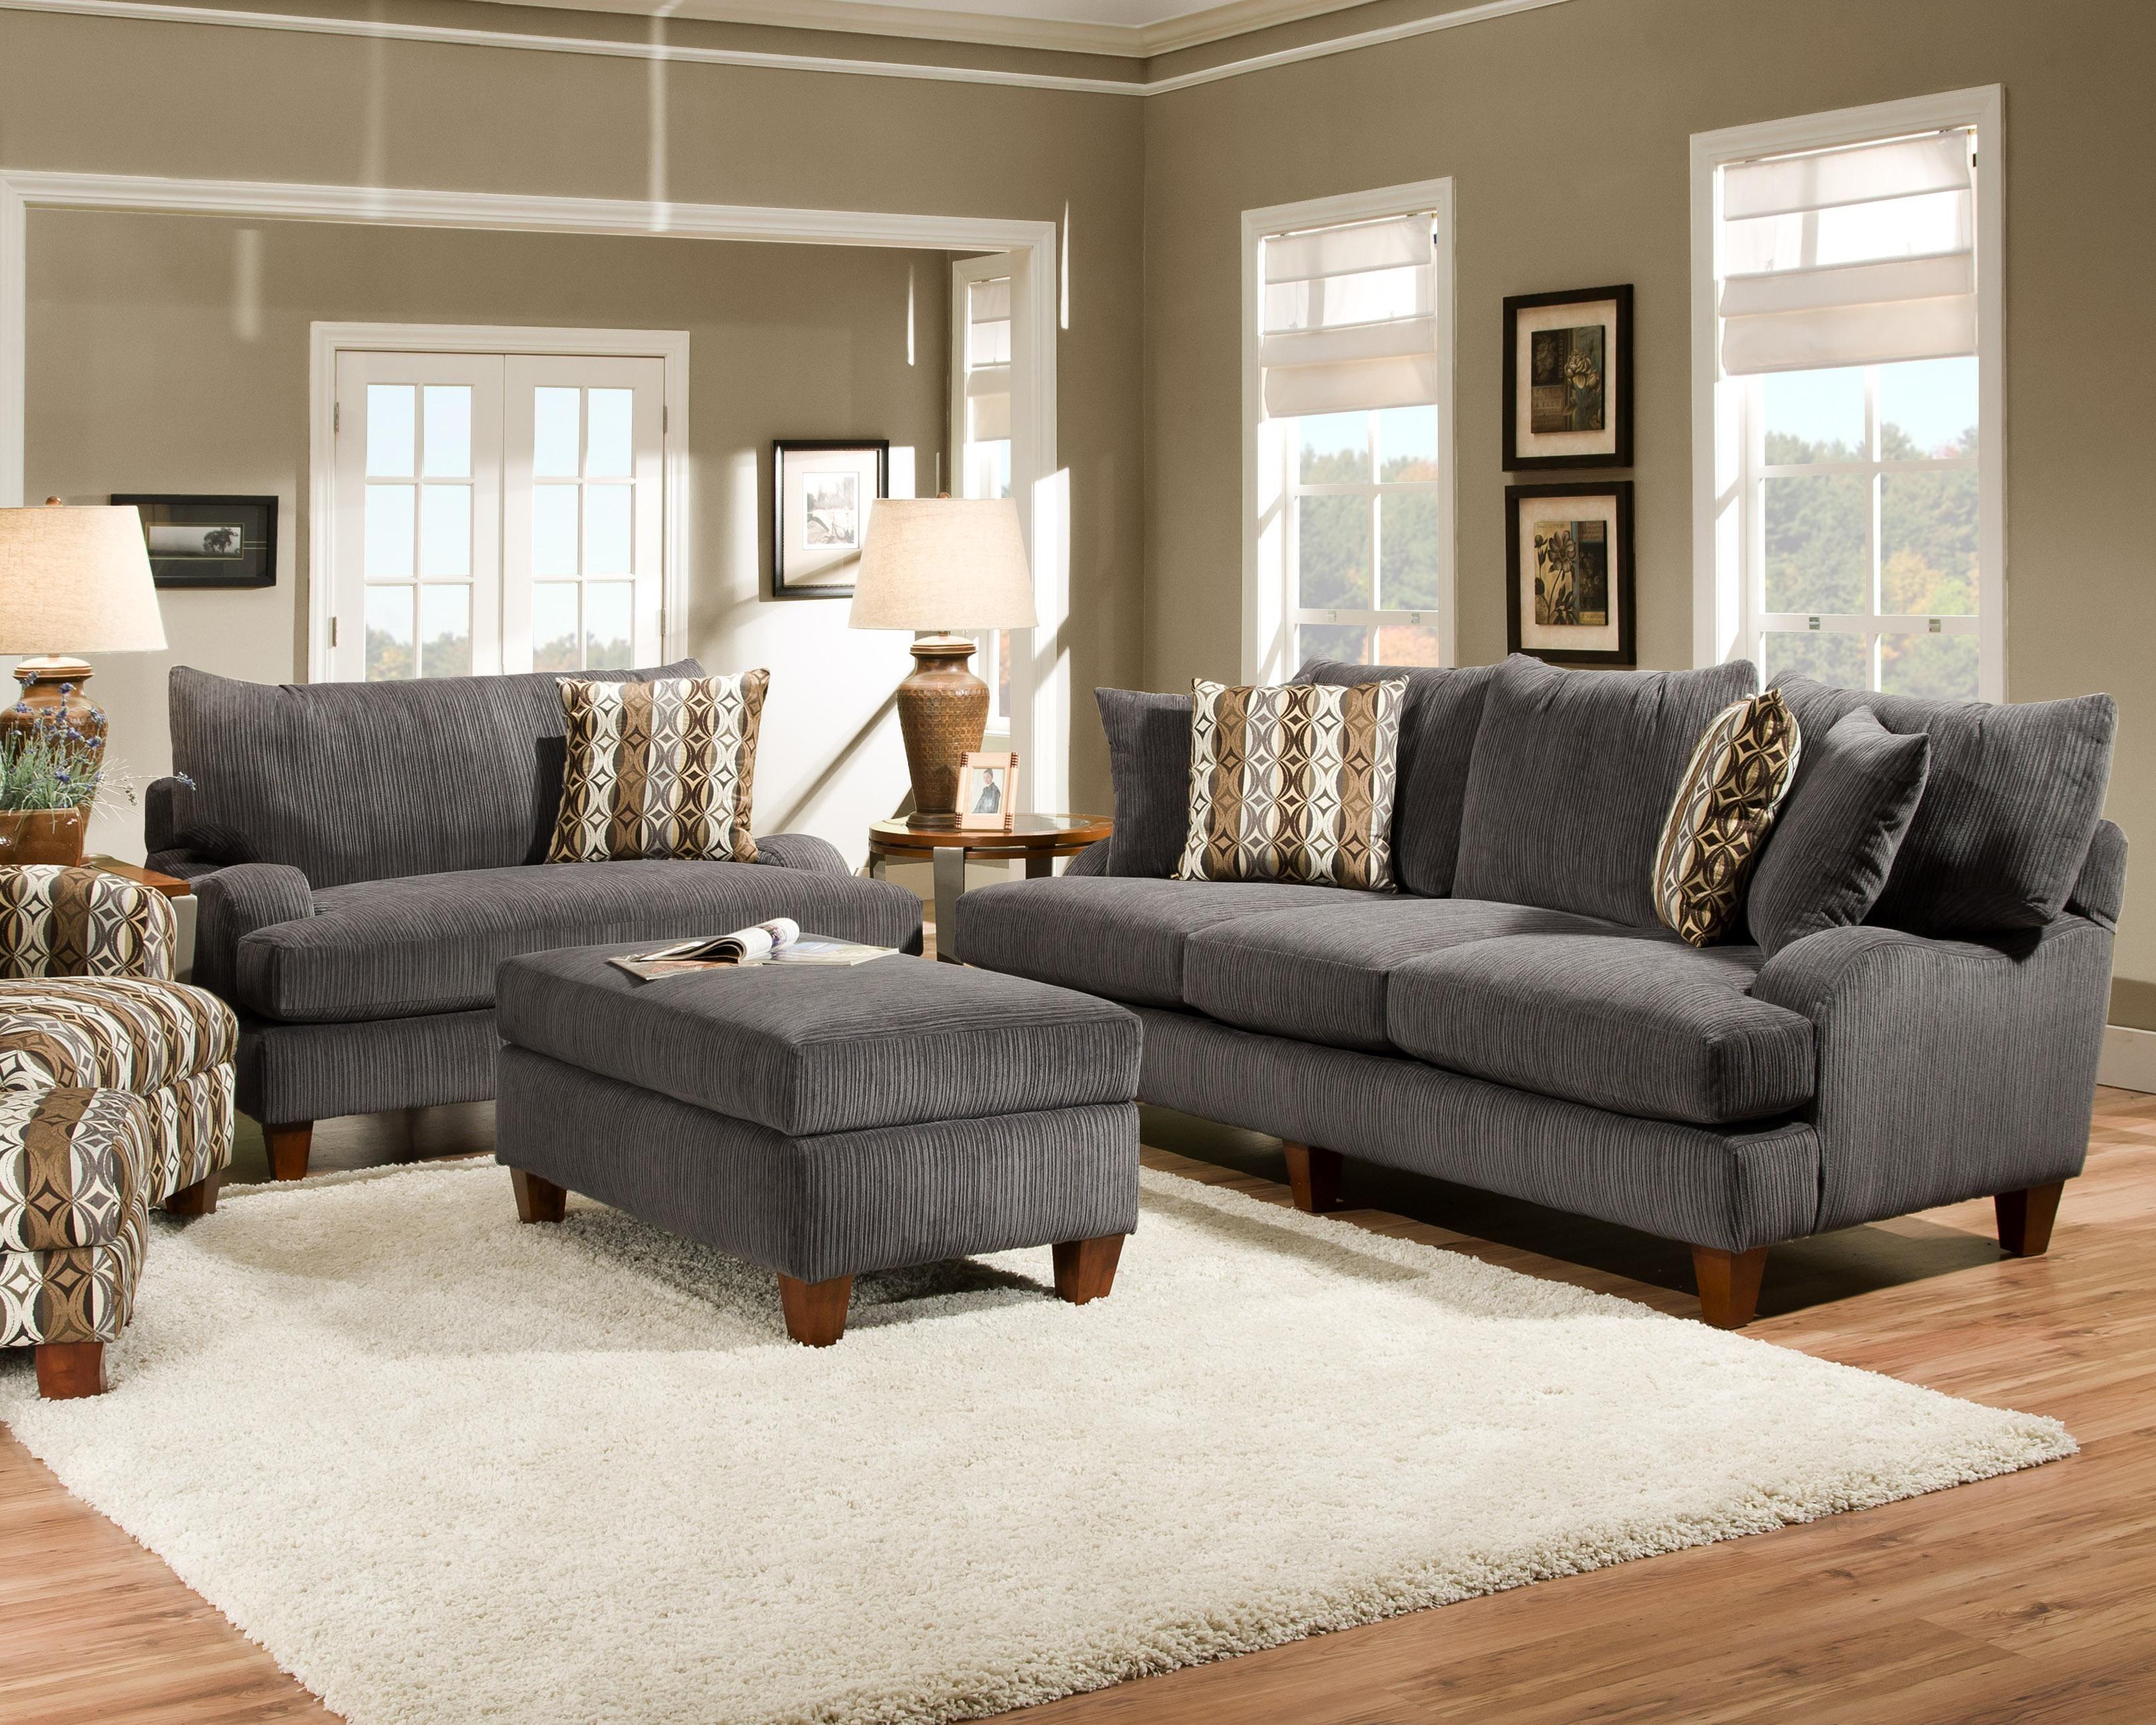 Dark Gray Couch Living Room Ideas Tan Living Room Grey